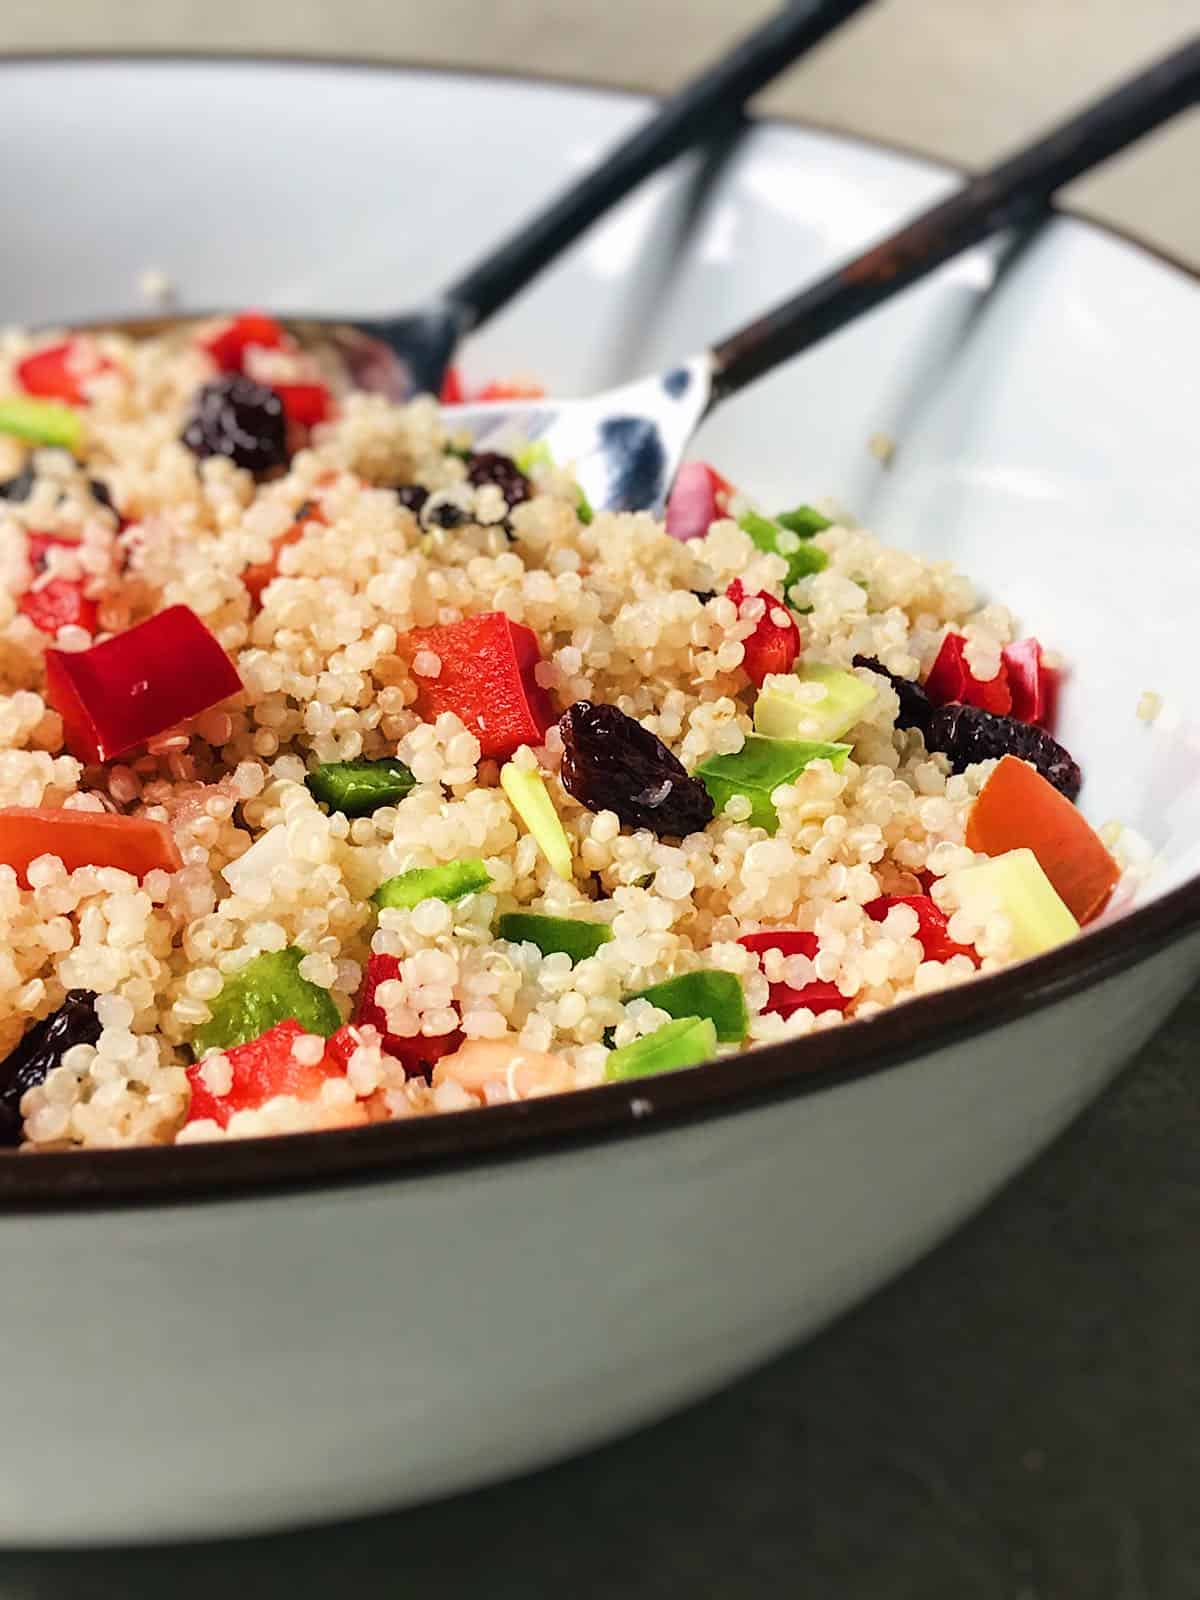 como preparar tabule de quinoa